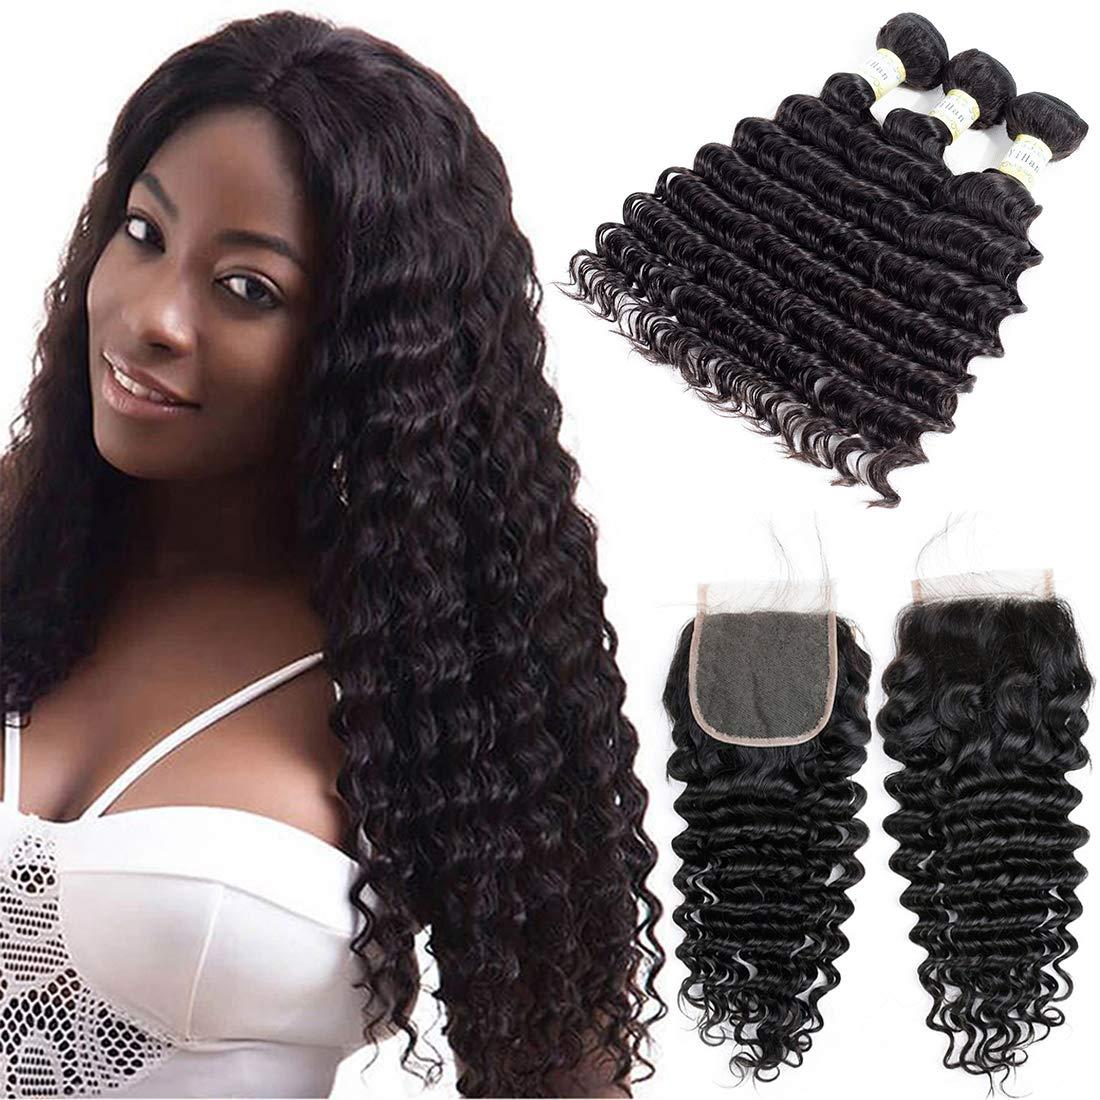 YiHan Brazilian Deep Wave Virgin Hair 3 Bundles With Closure Wet And Wavy Human Hair Weave Bundles With 4x4 Free Part Lace Closure With Baby Hair Bleach Knots Natural Black Color 22 24 26+20 Inches